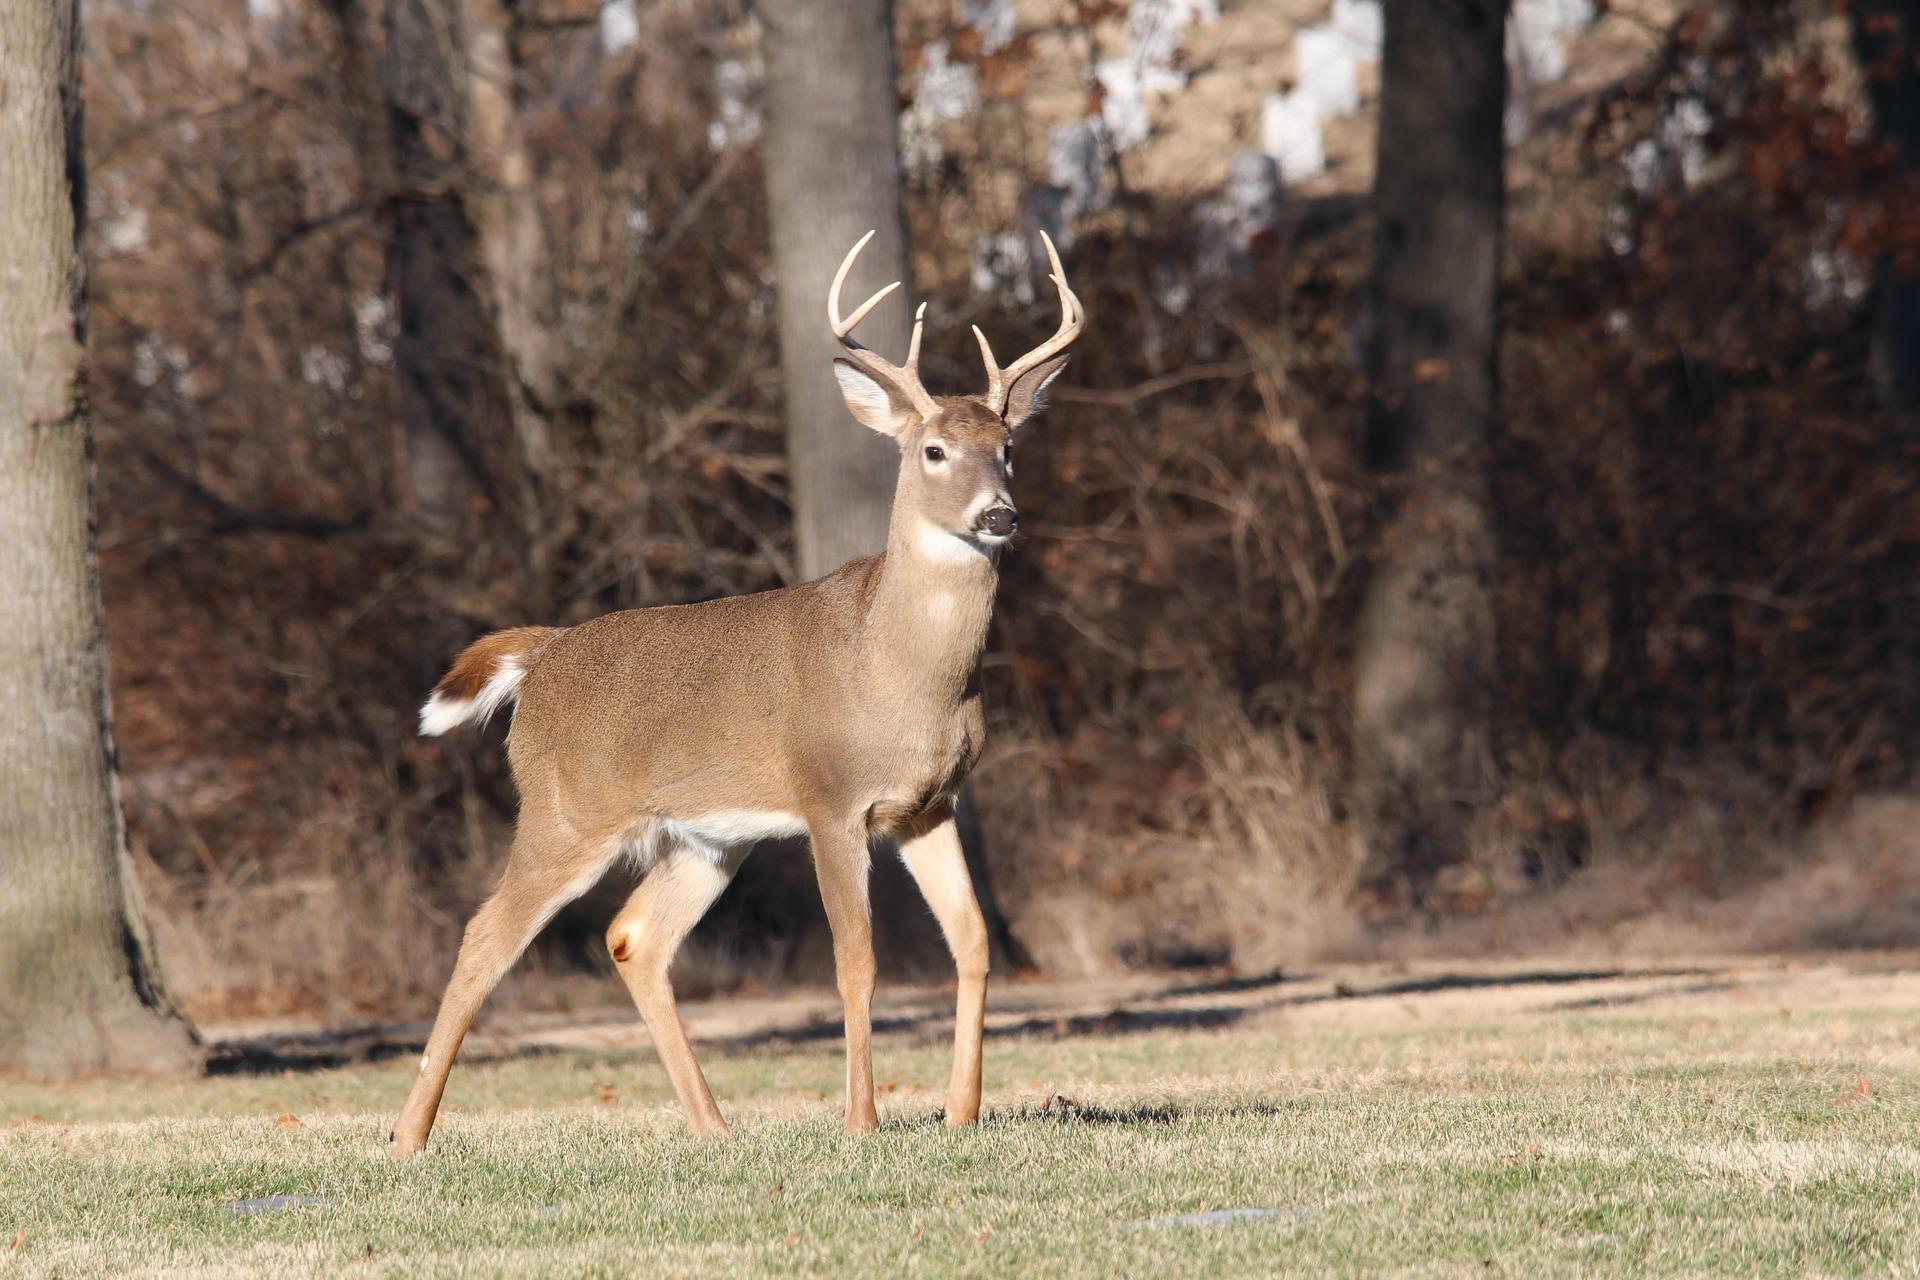 buck-fever-solutions-huntinghypnosis-archery-new-jersey-flemington-bethlehem-online.jpg